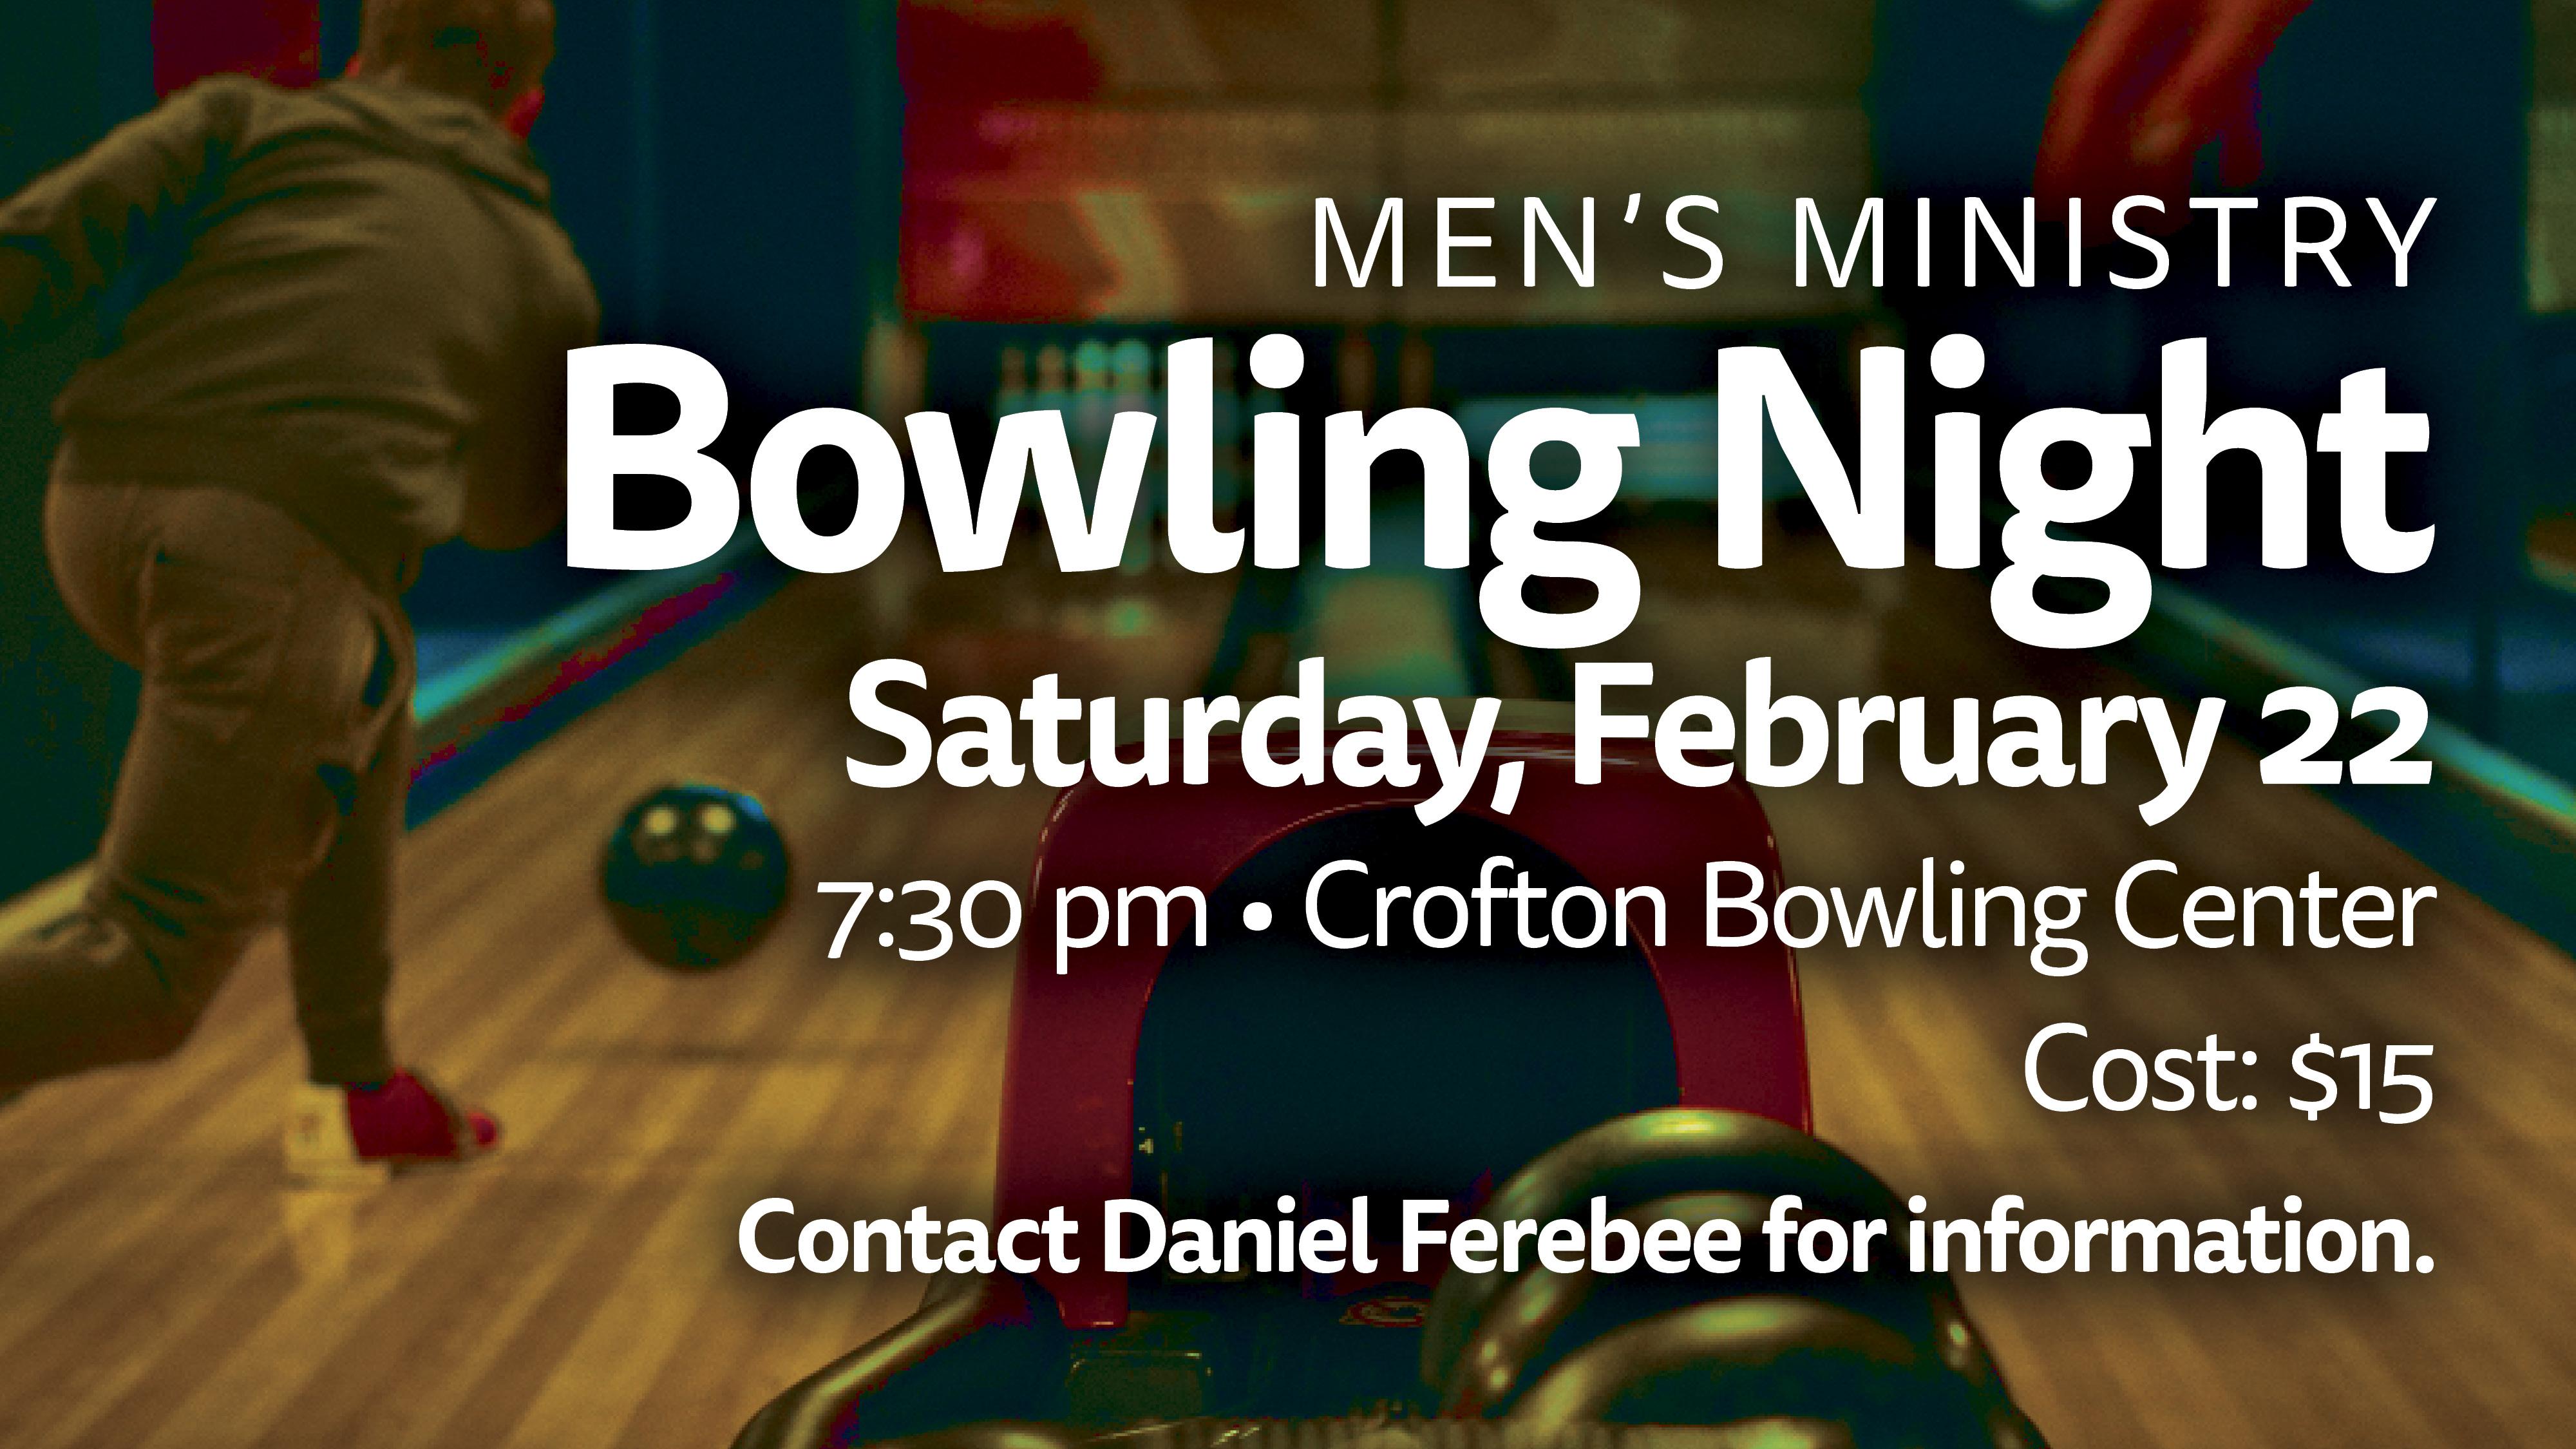 Men's Bowling Night